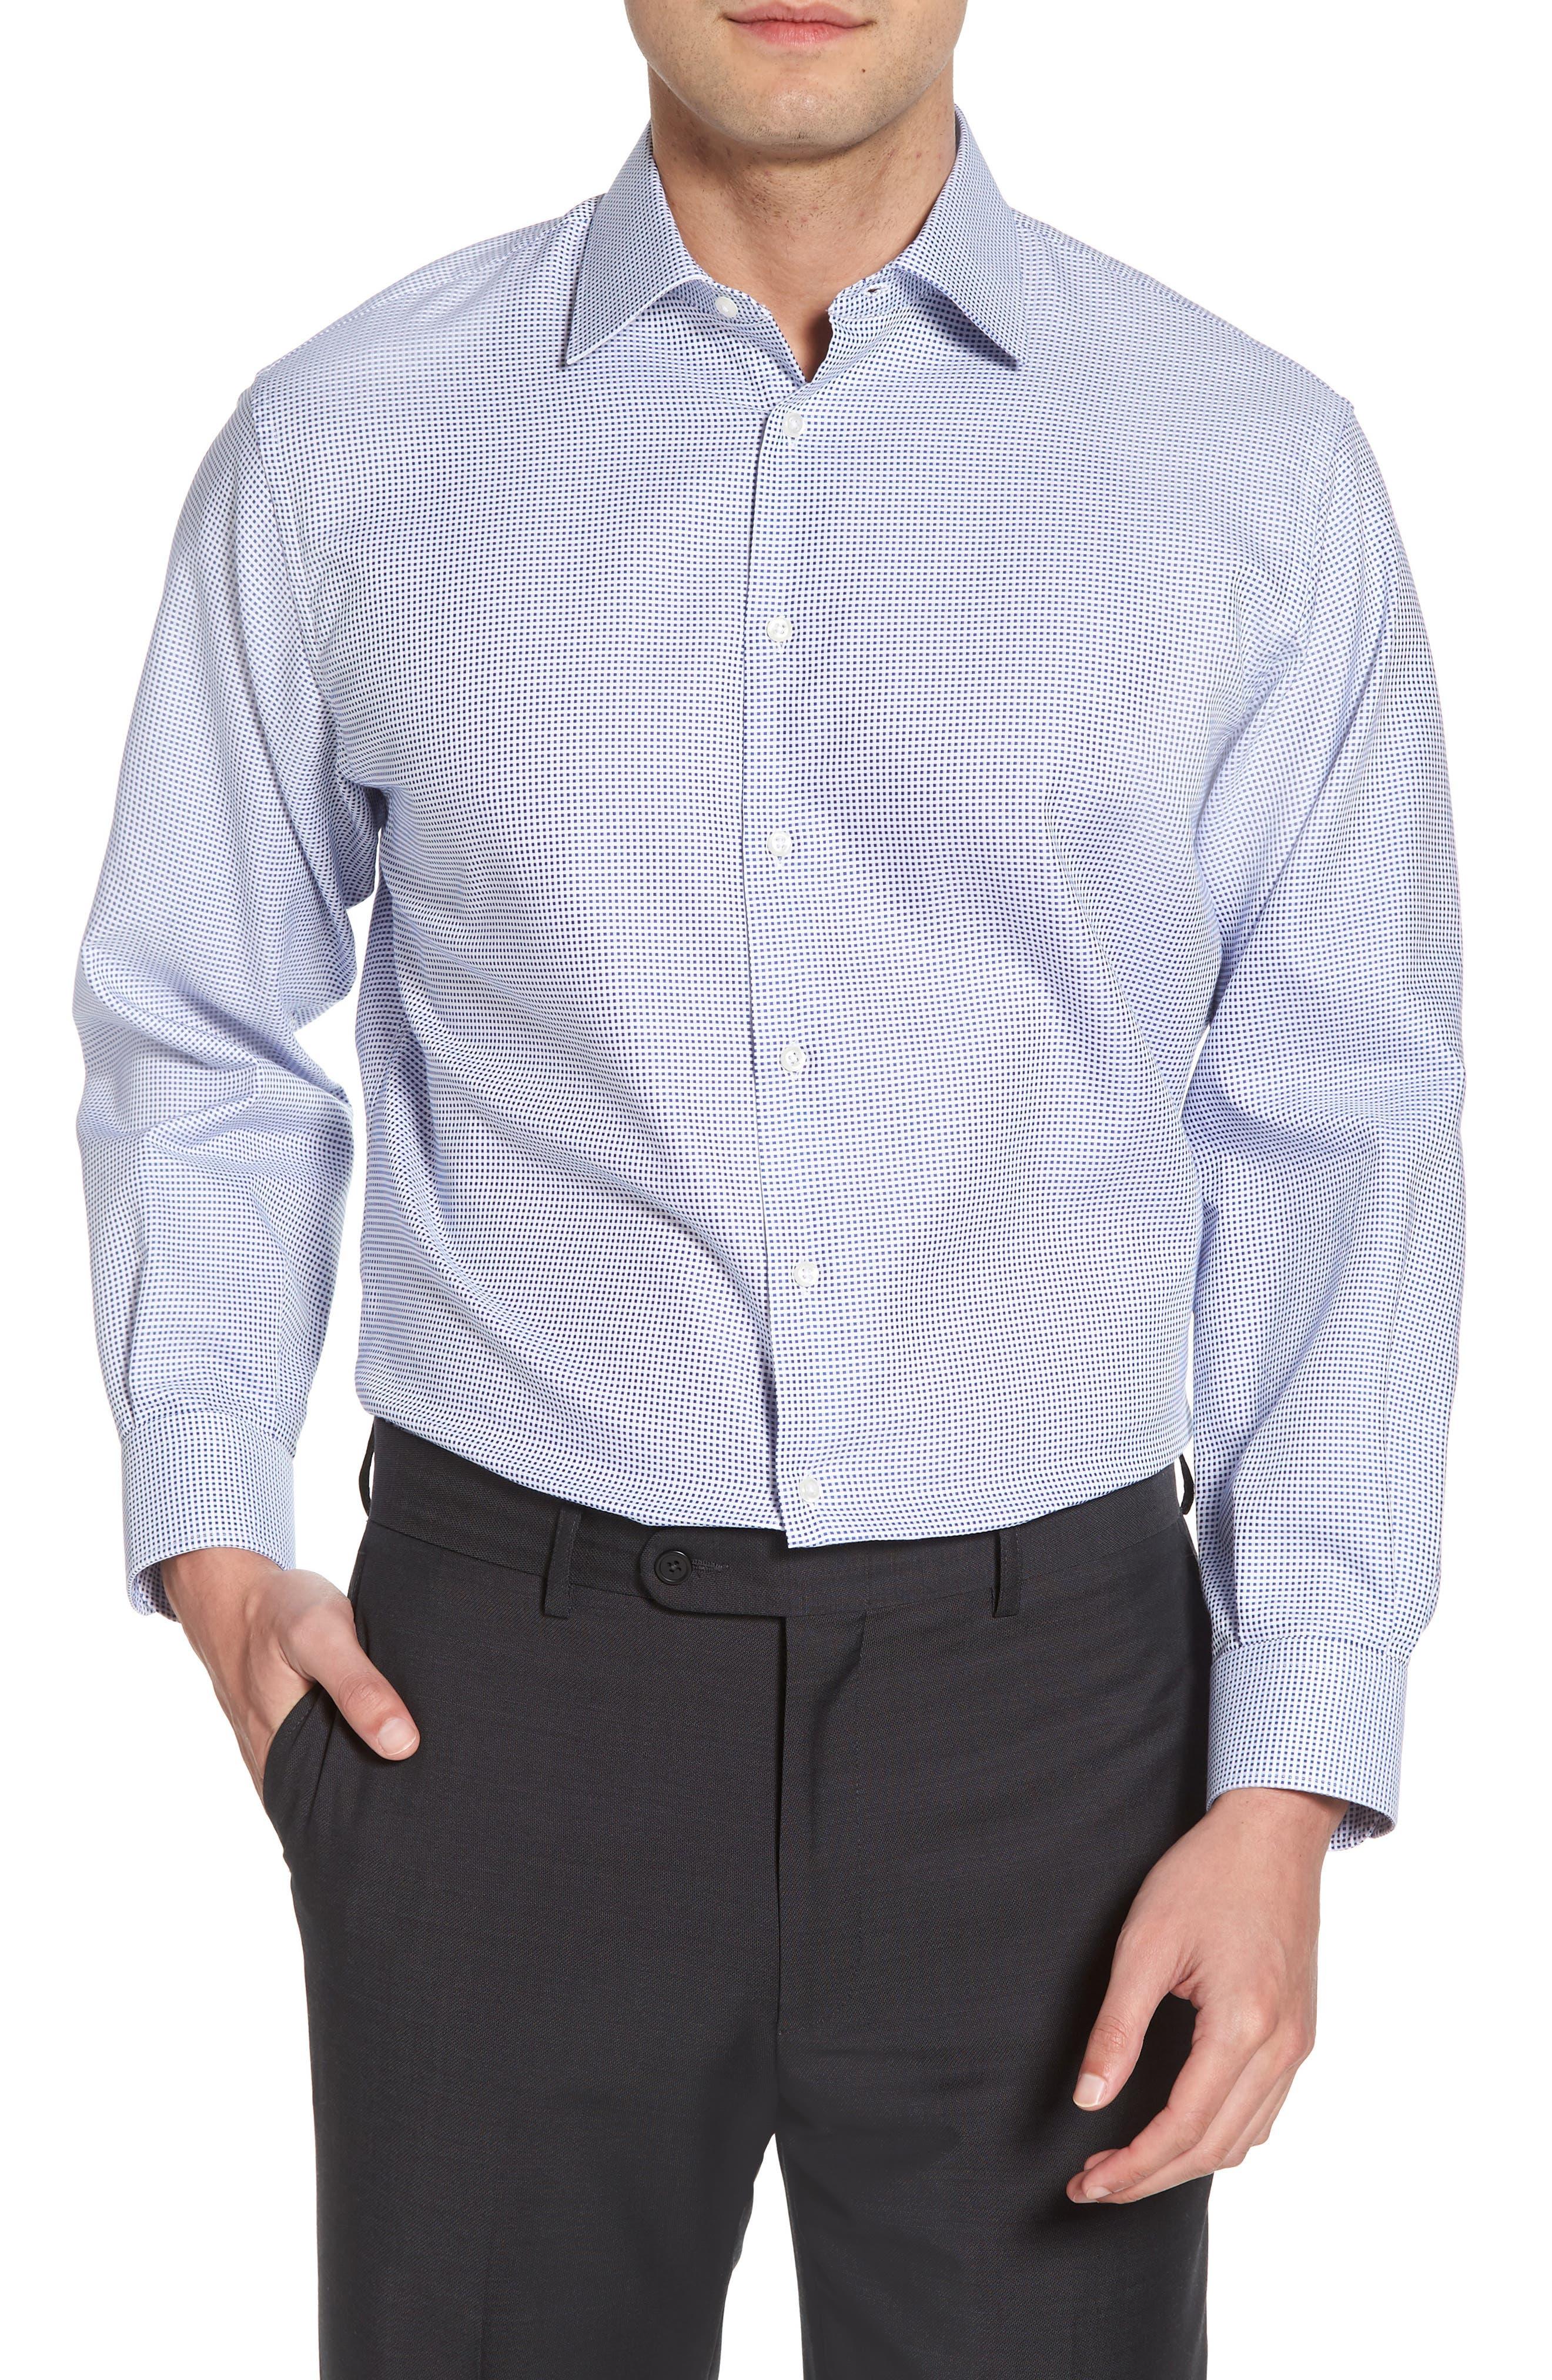 Main Image - Nordstrom Men's Shop Classic Fit Microcheck Dress Shirt